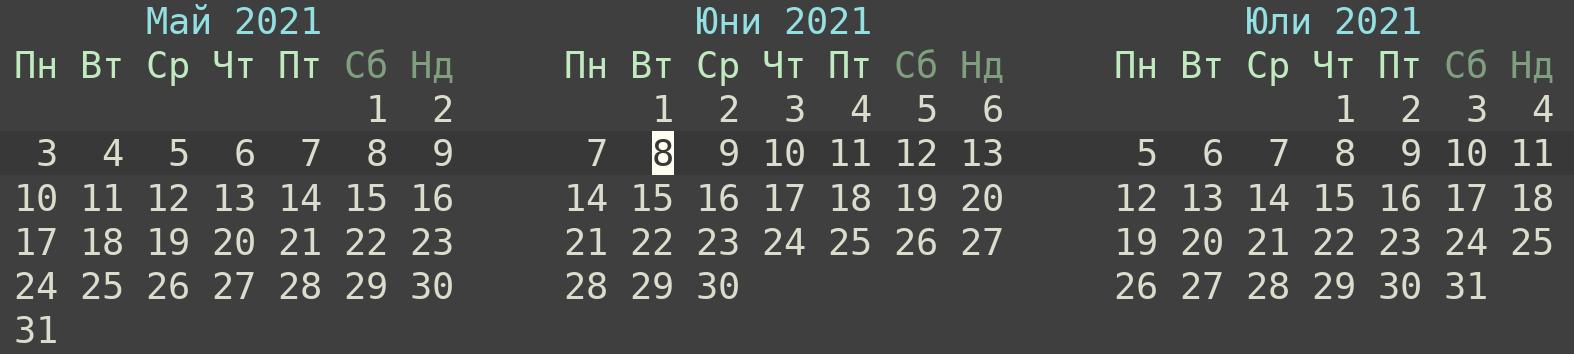 calendar_bulgarian.png